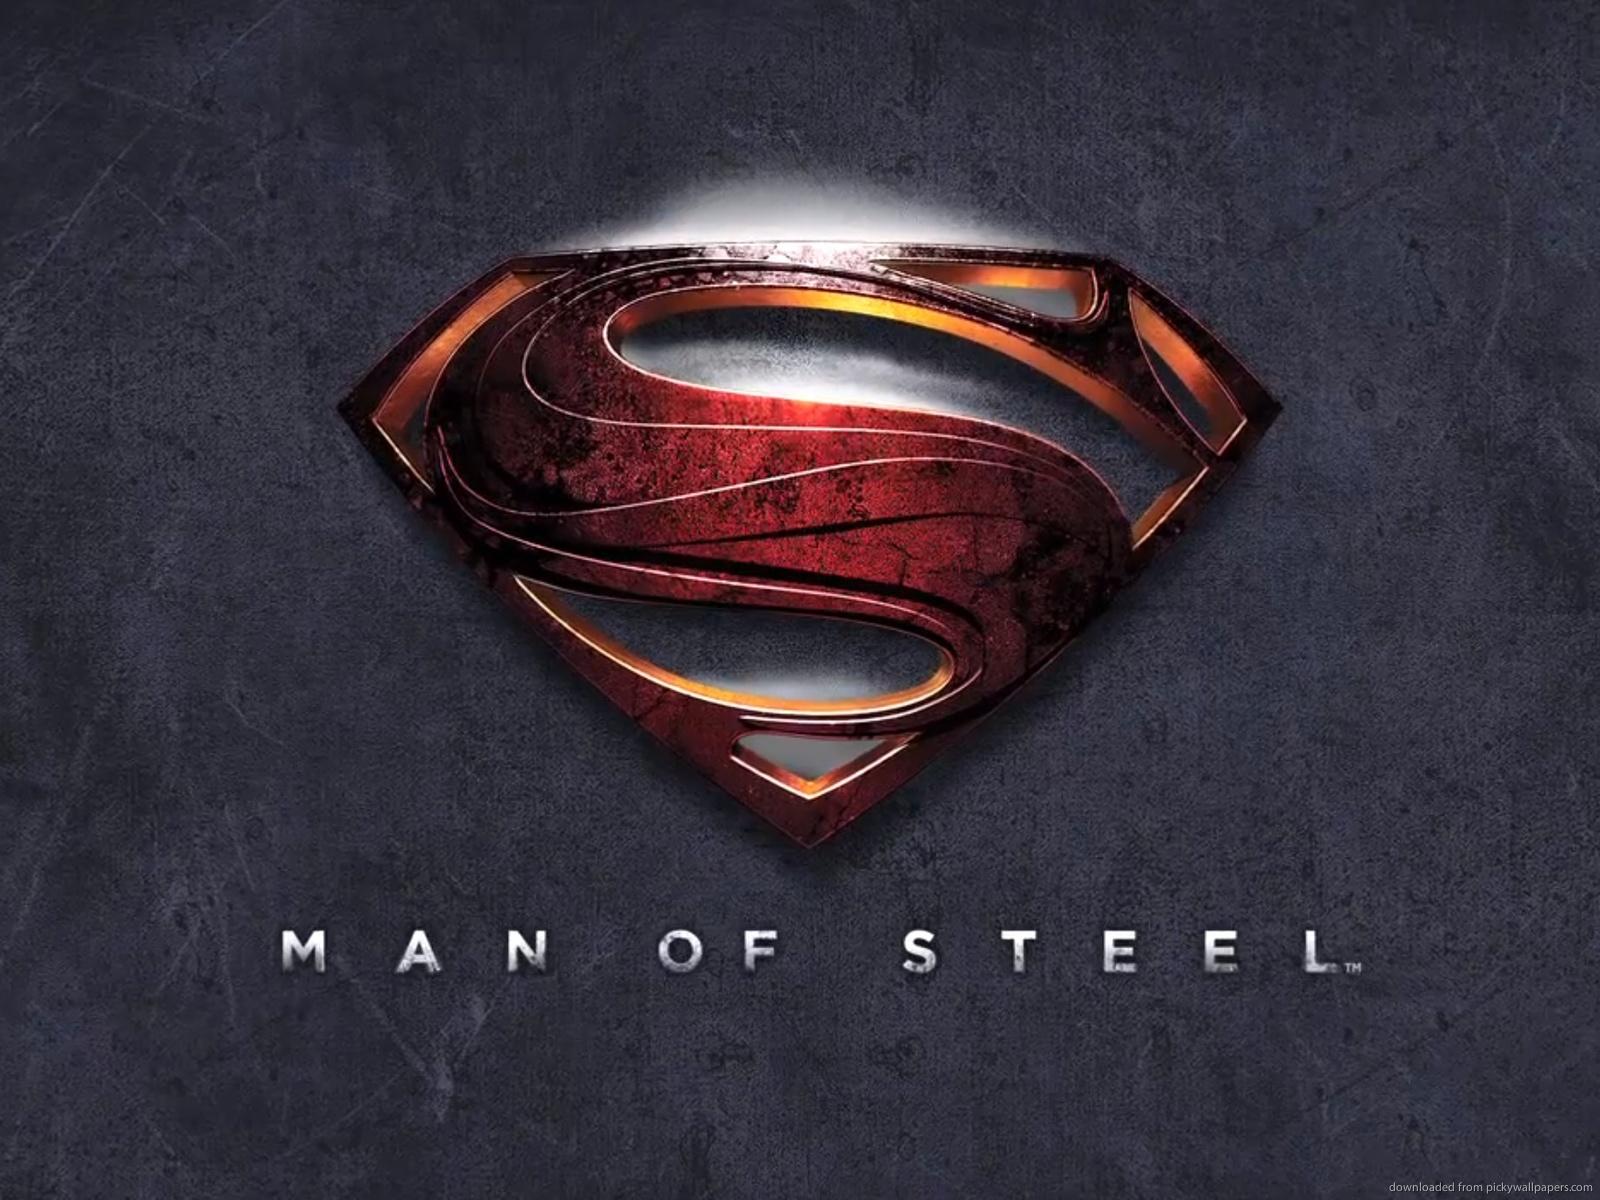 Download 1600x1200 Man Of Steel Logo Wallpaper 1600x1200